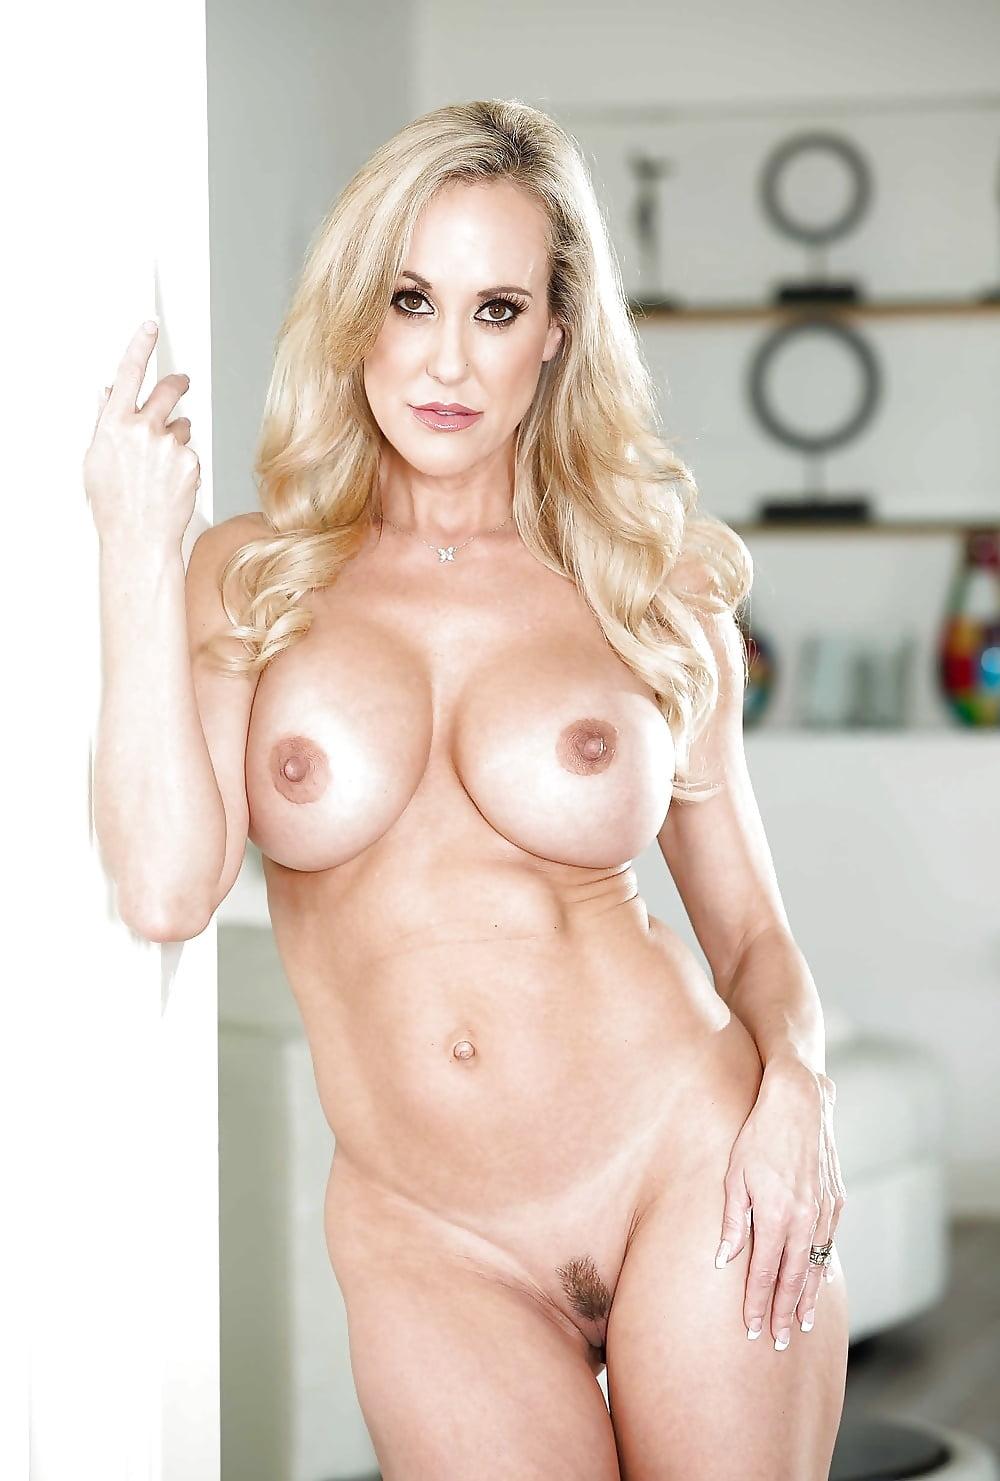 Brandi hawbaker nude, hien video wife ass